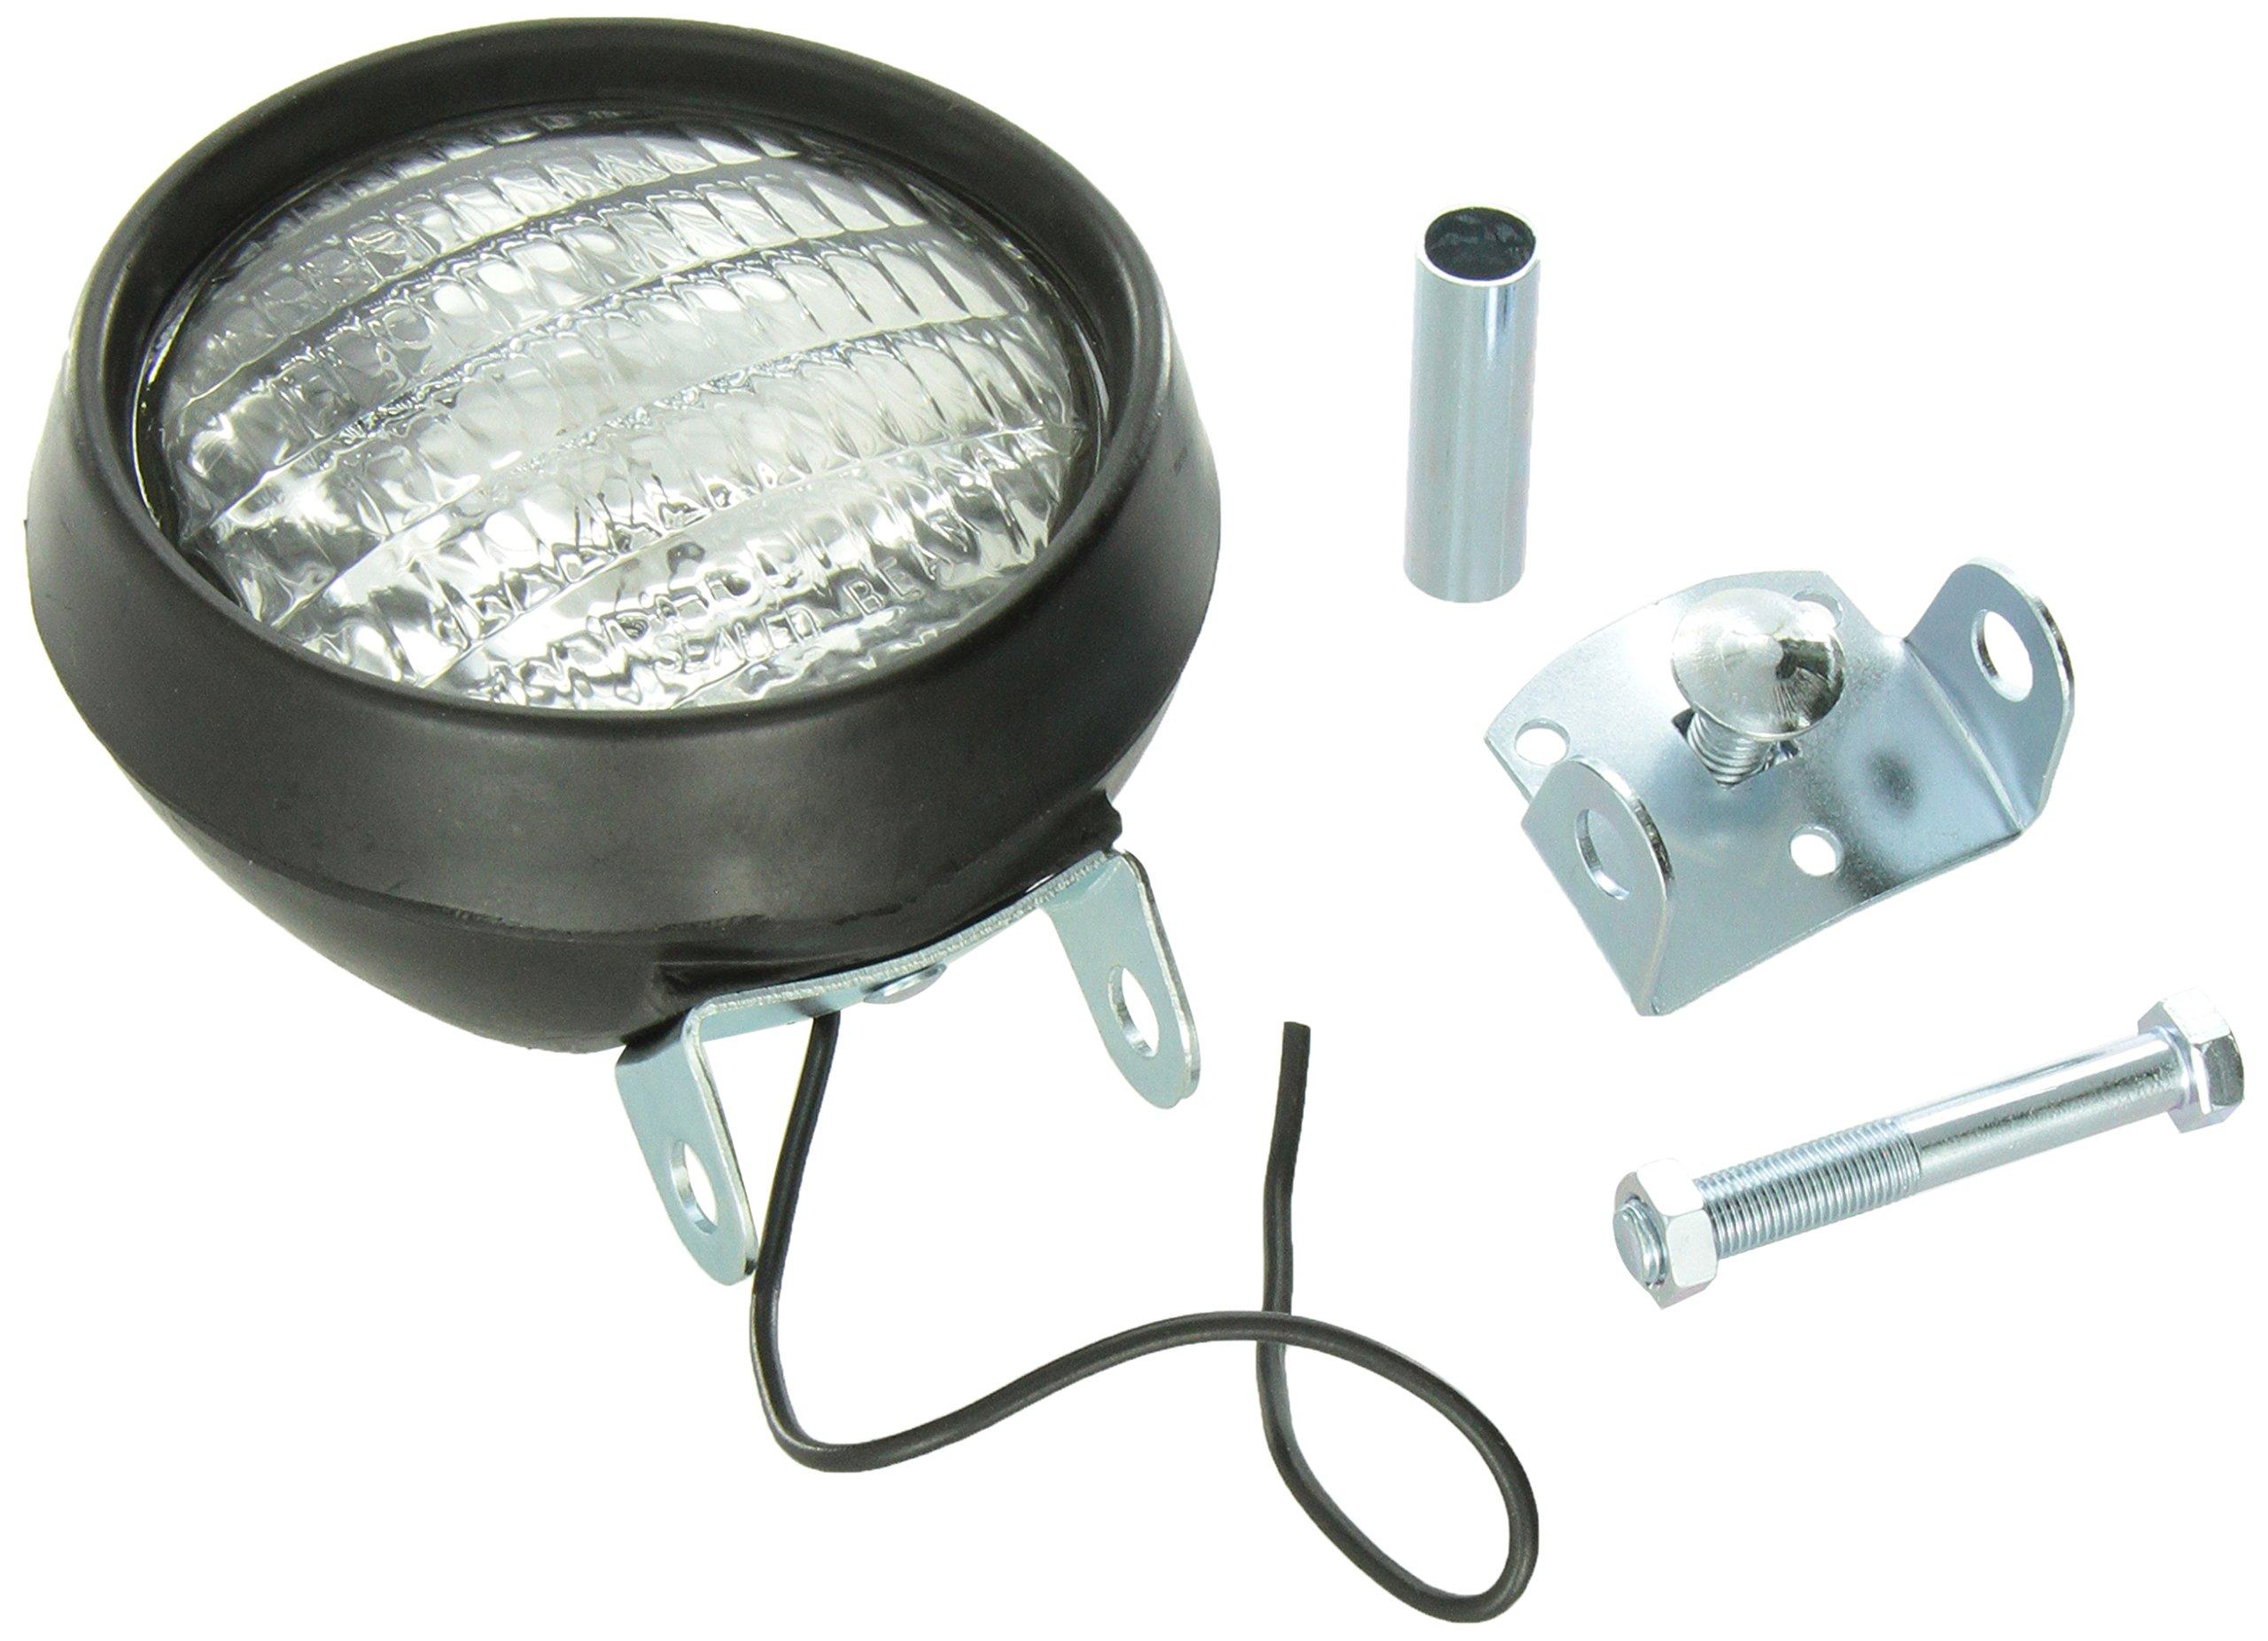 Grote 64931 Par 36 Utility Lamp (Rubber Tractor, Incandescent)